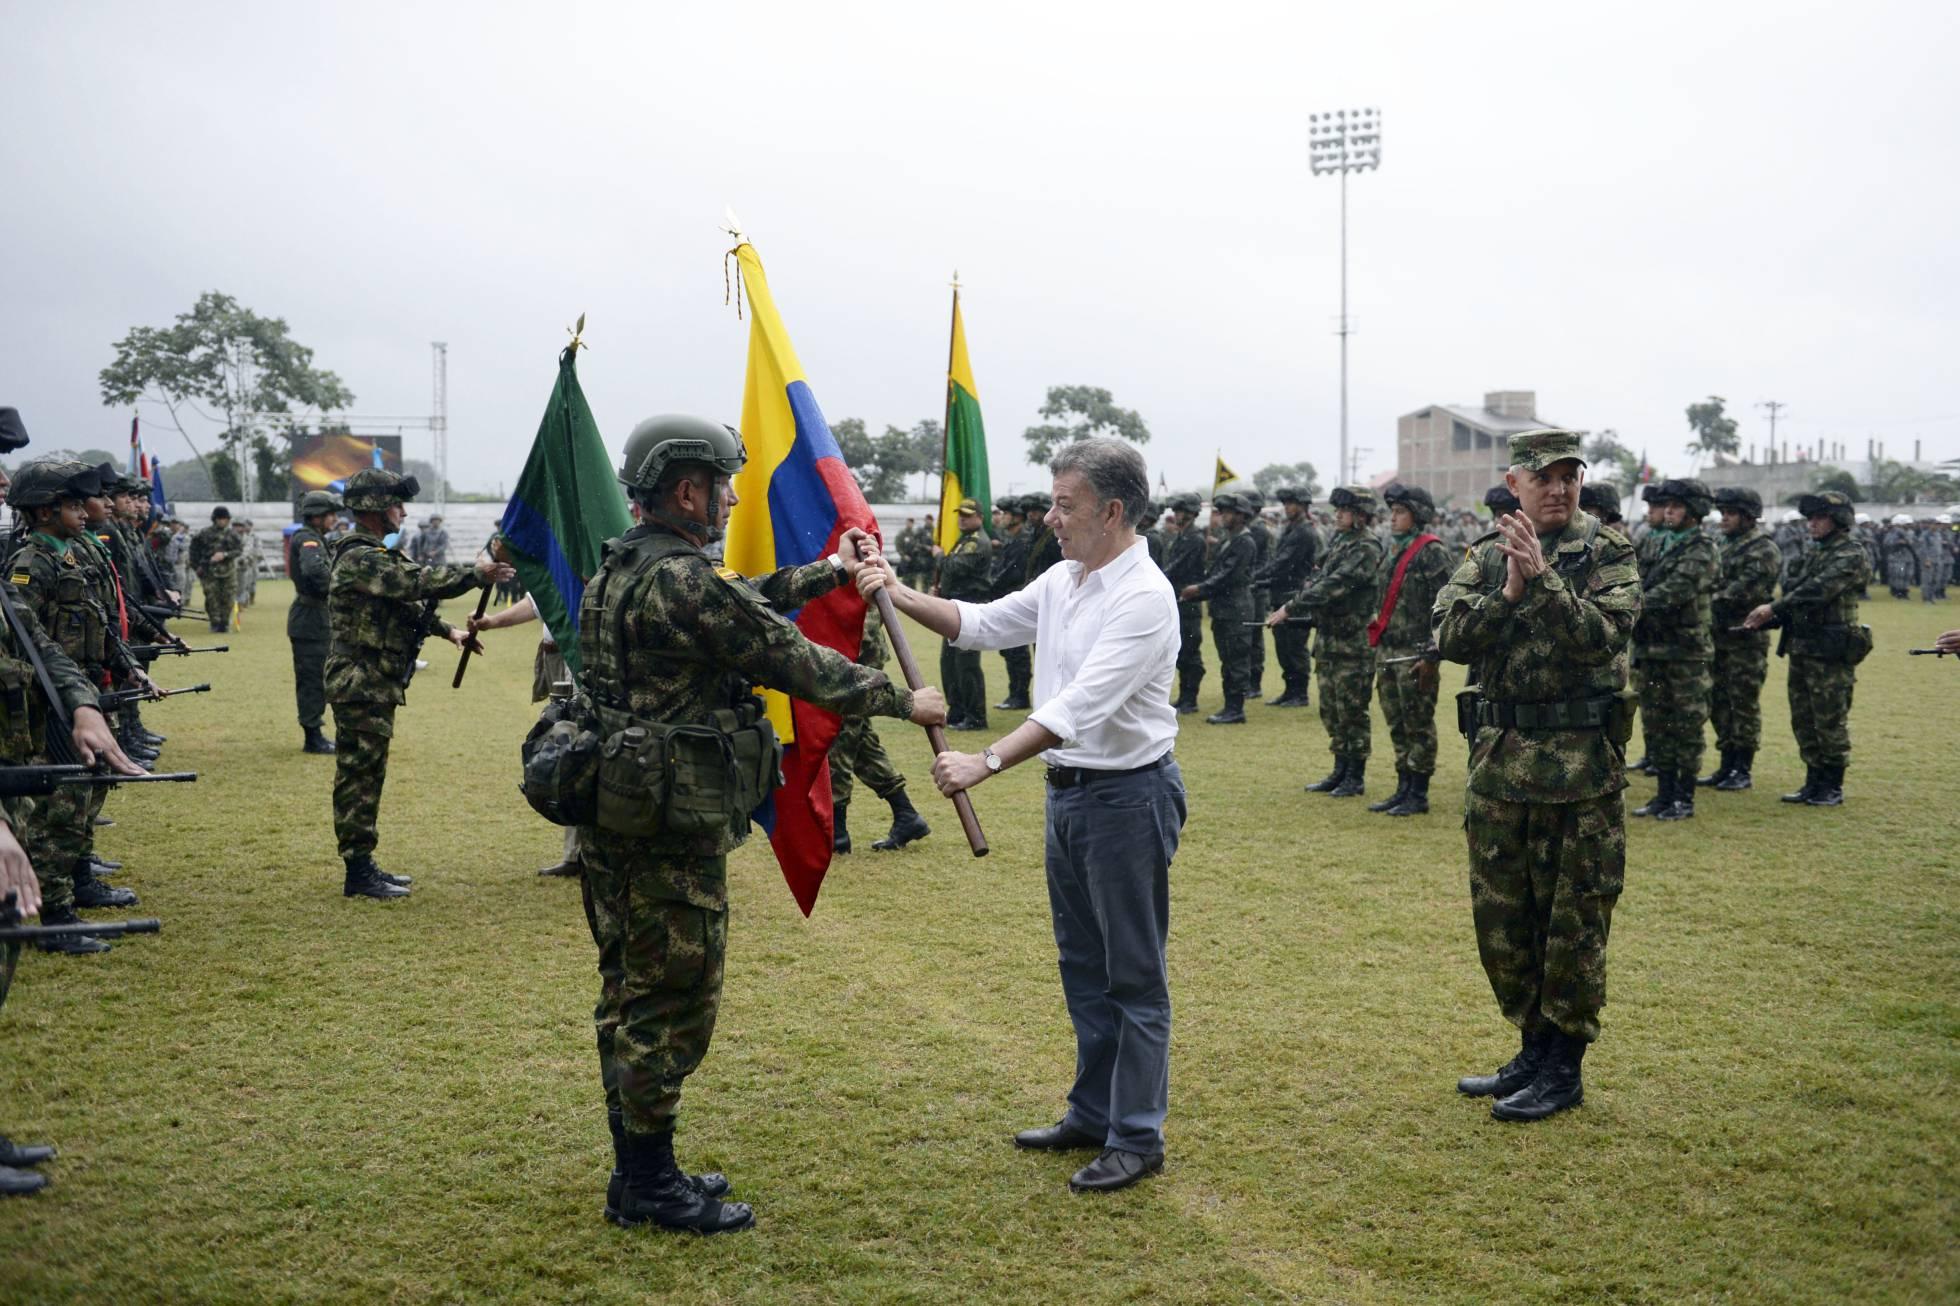 Foto: JUAN DAVID TENA PRESIDENCIA COLOMBIA